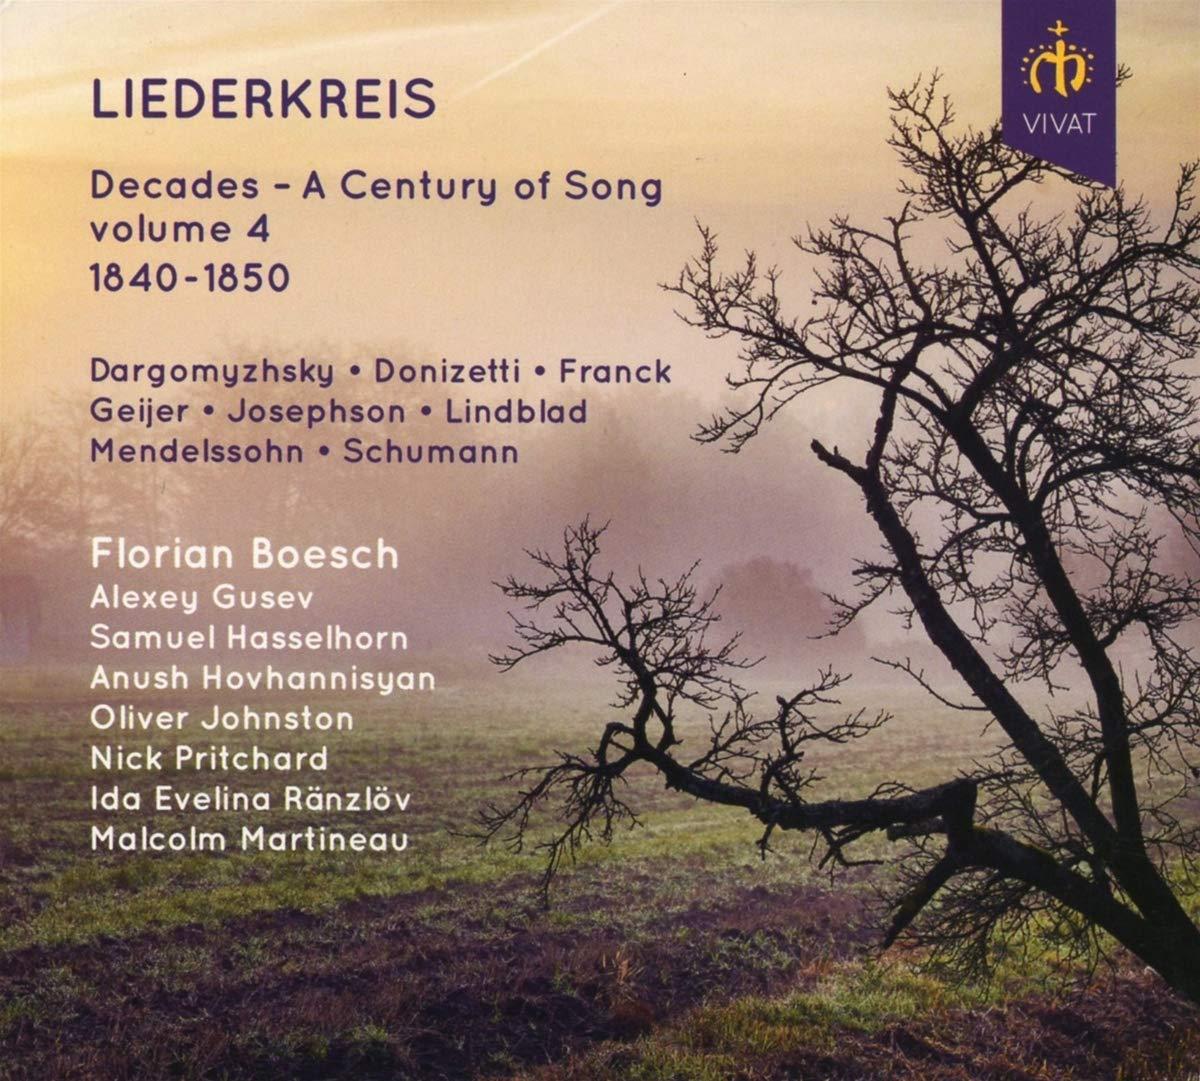 Review of Liederkreis: Decades – A Century of Song, Vol 4: 1840-1850